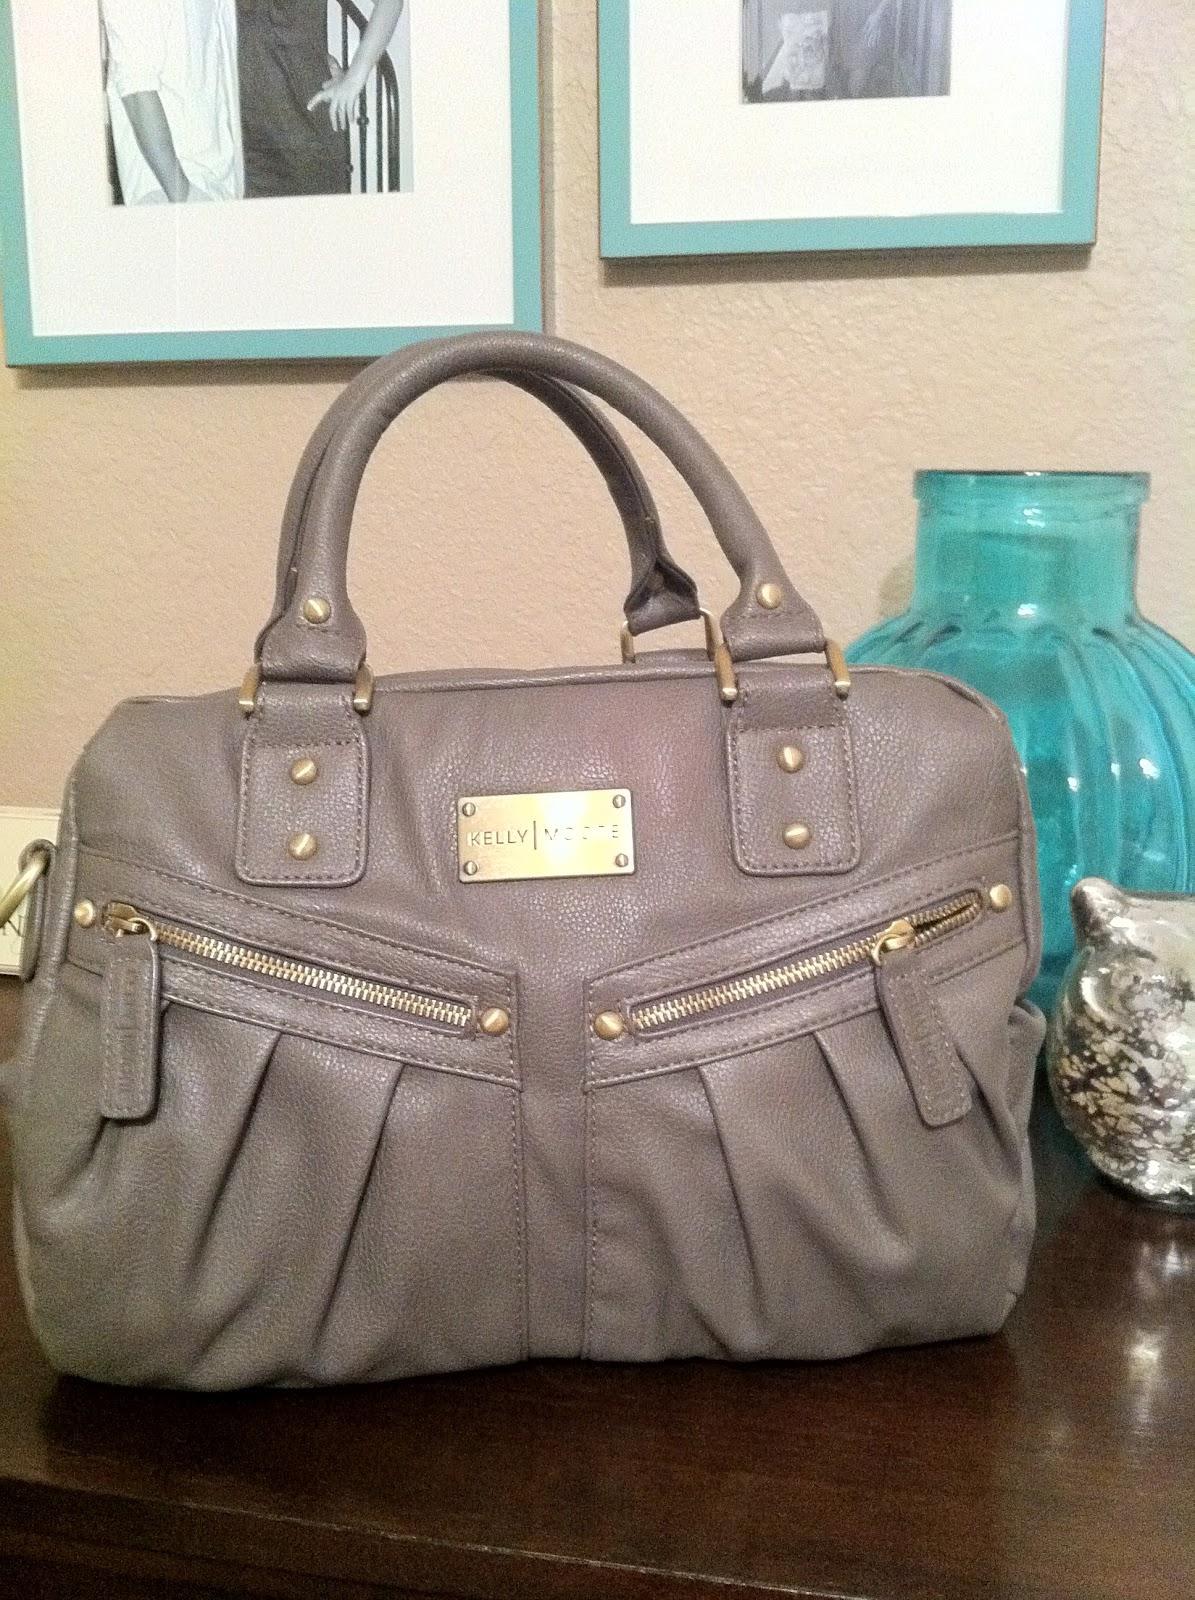 http://4.bp.blogspot.com/-yvaBbVBX4CQ/UBfEcUmz2dI/AAAAAAAABNU/UZu9reGrXeE/s1600/kelly+moore+mimi+bag+-+gray.JPG